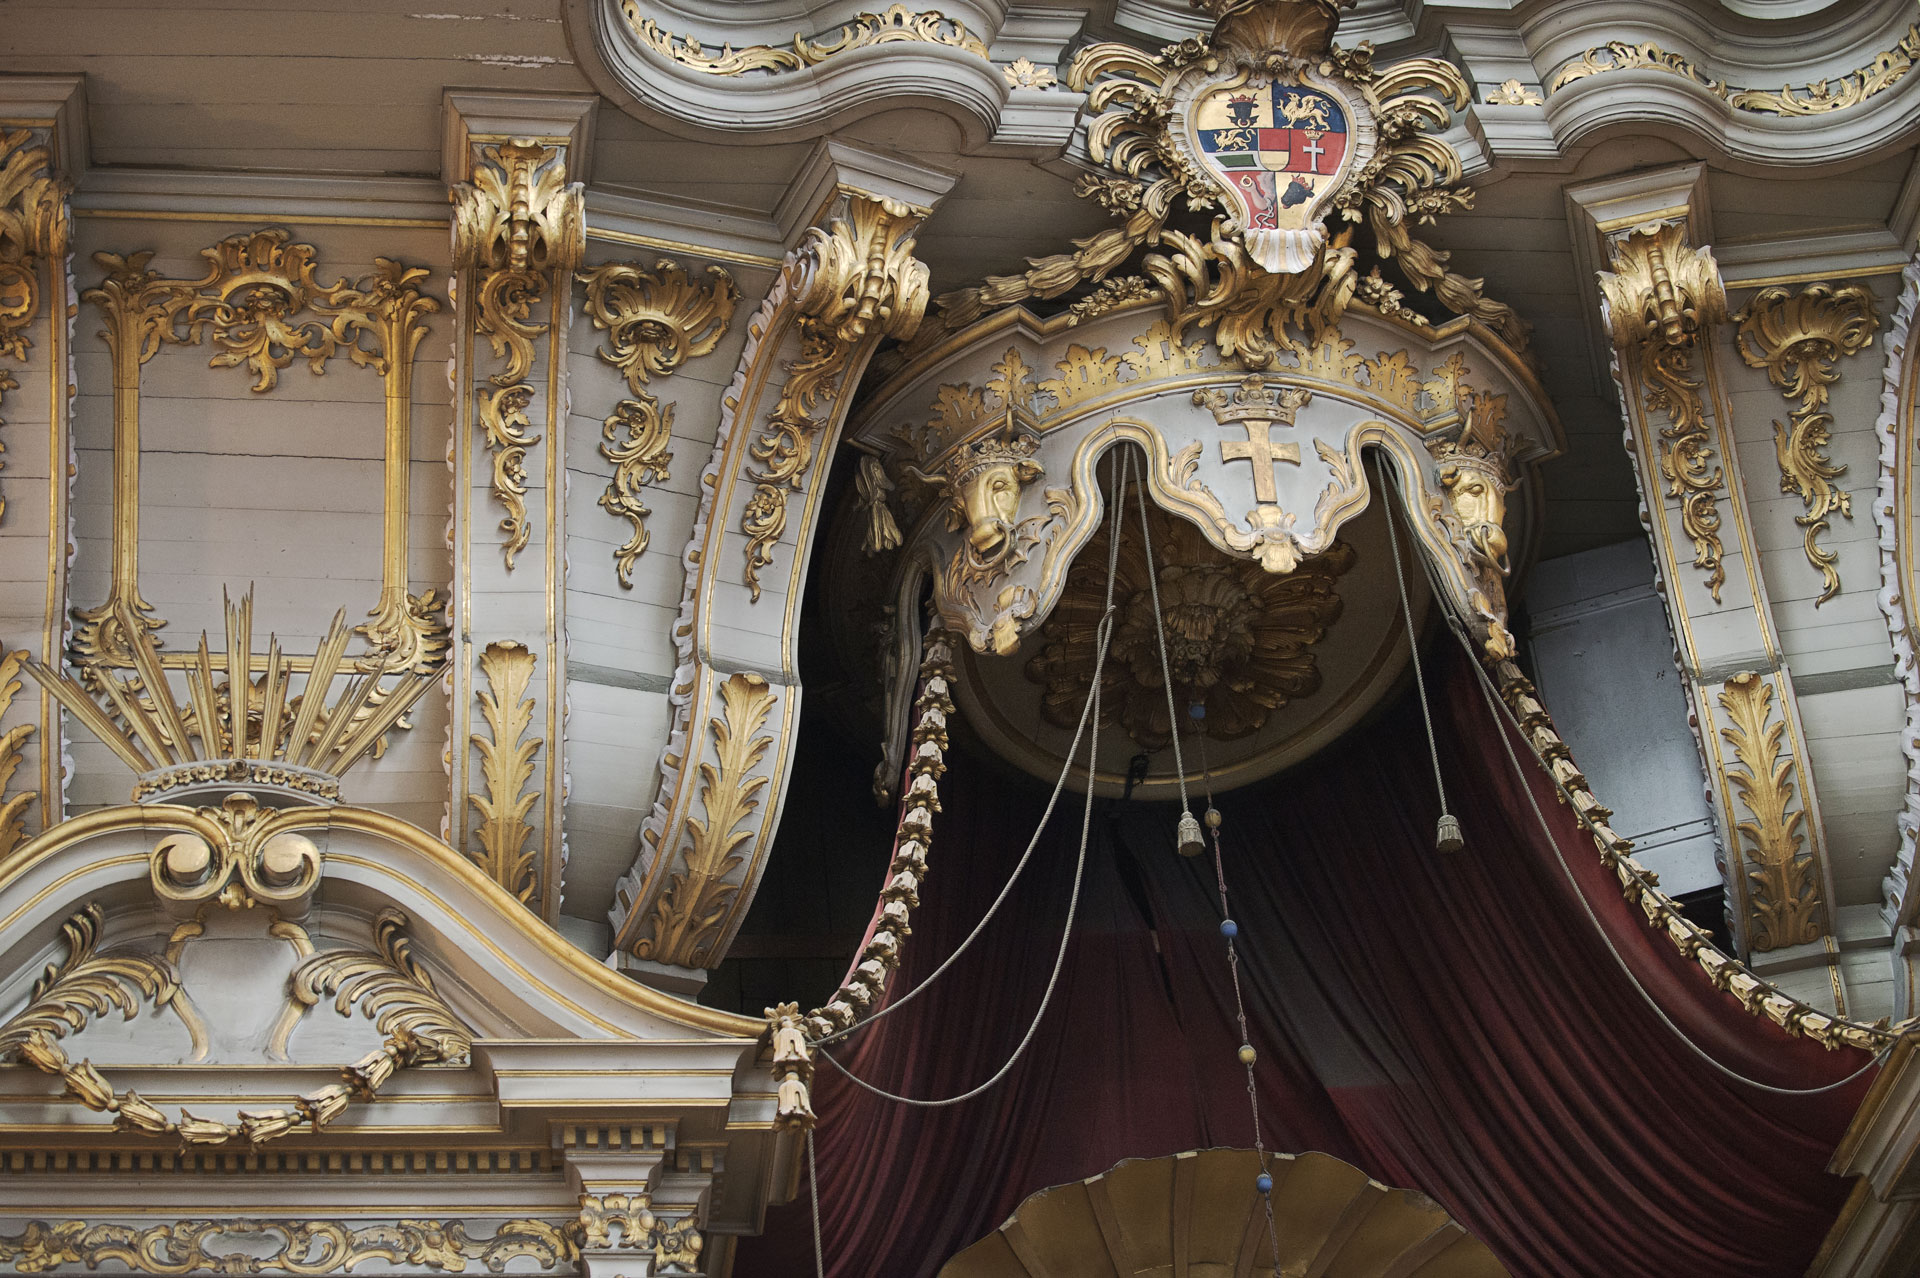 Kretzschmars Historische Konzerte